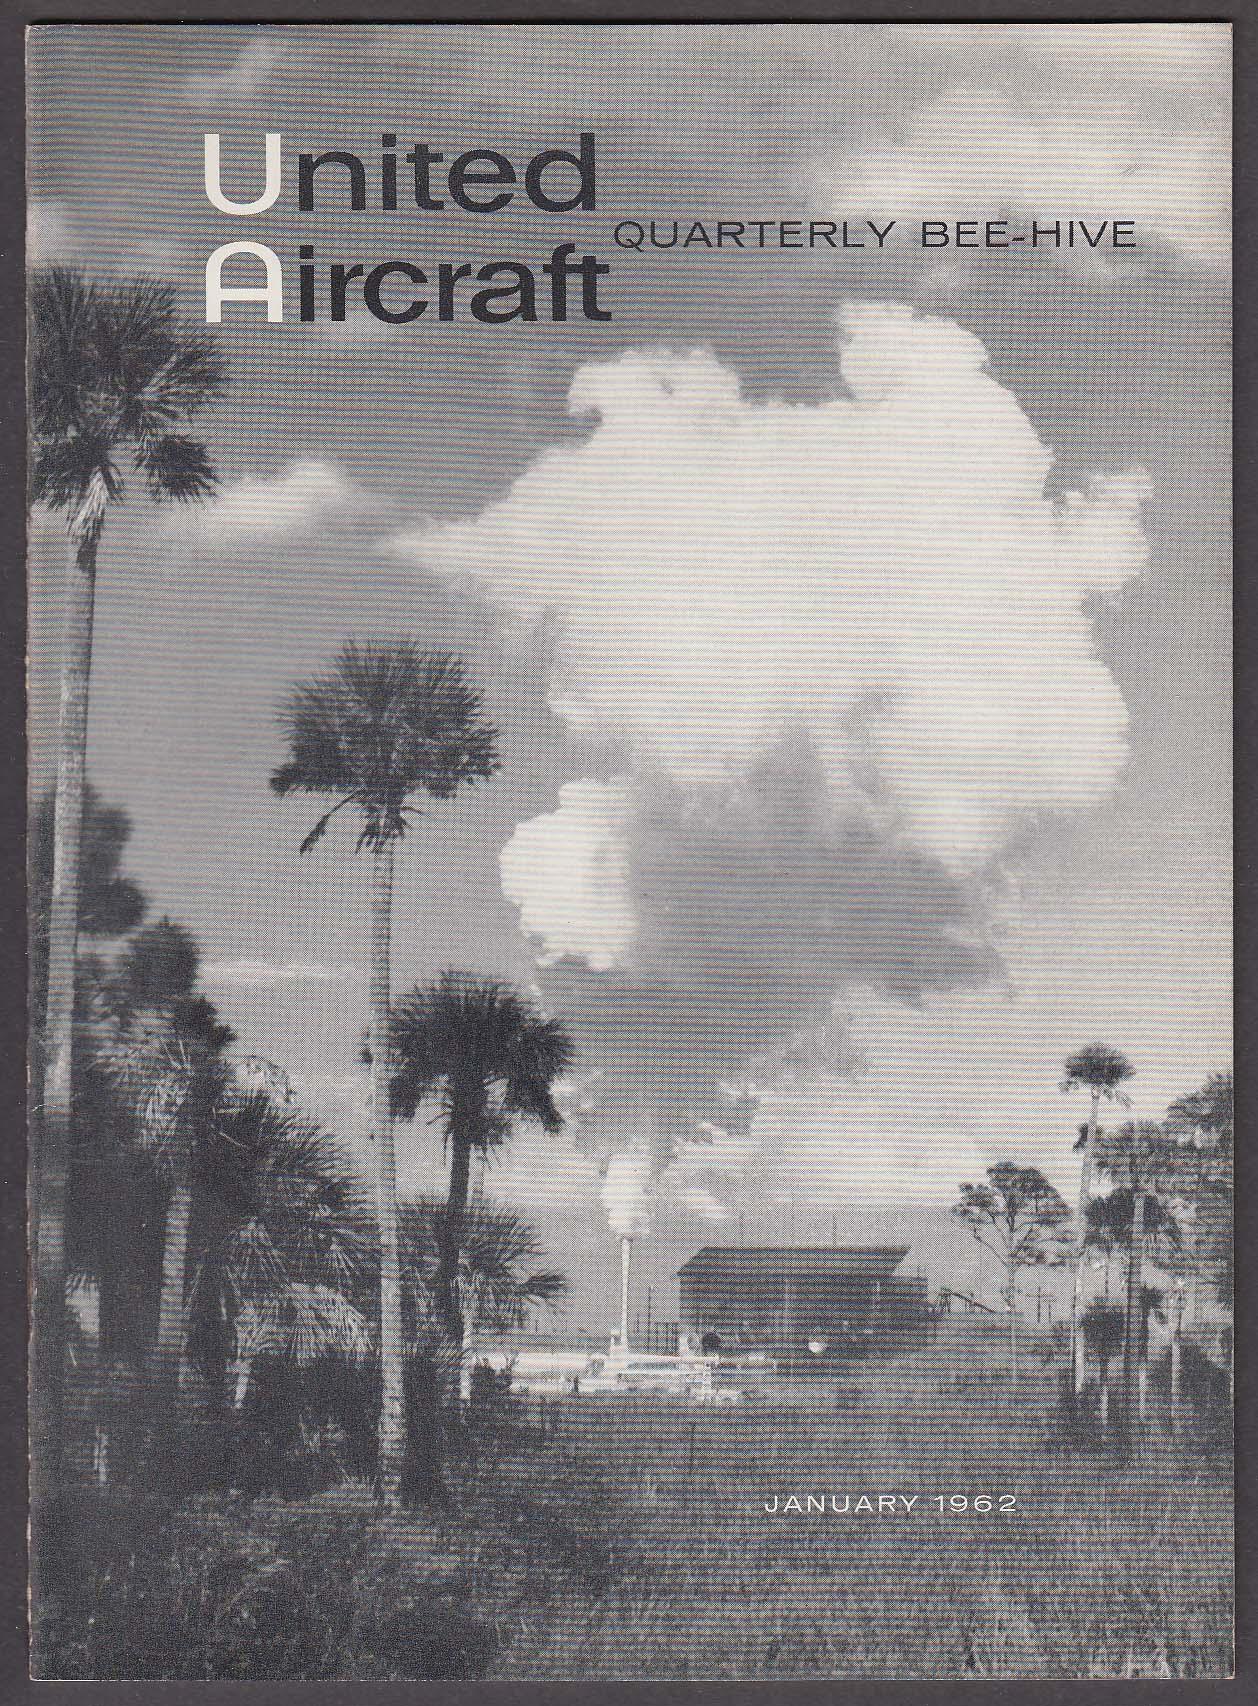 BEE-HIVE United Aircraft Quarterly Pratt & Whitney RL-10 ICBM F-105D + 1 1962